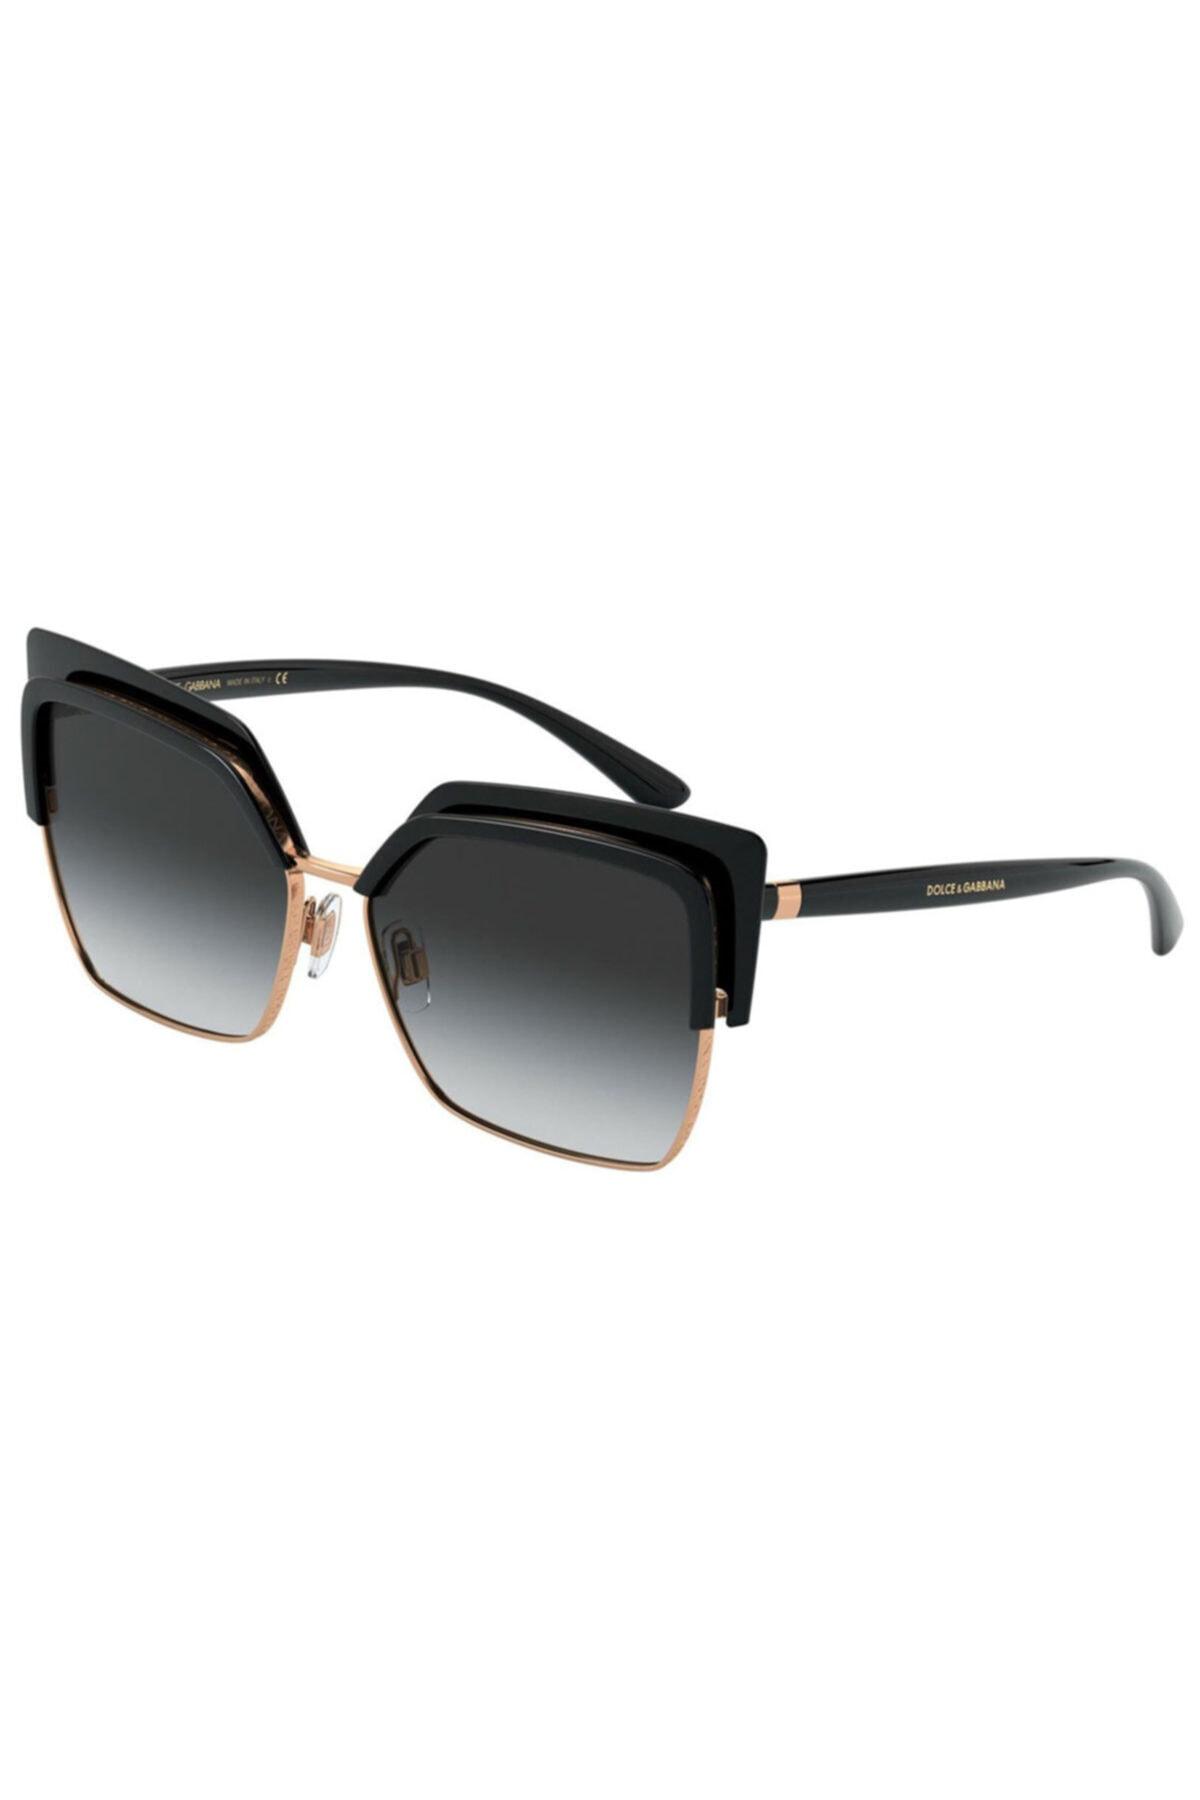 خرید پستی عینک آفتابی زیبا برند دولچه گابانا رنگ مشکی کد ty40739276